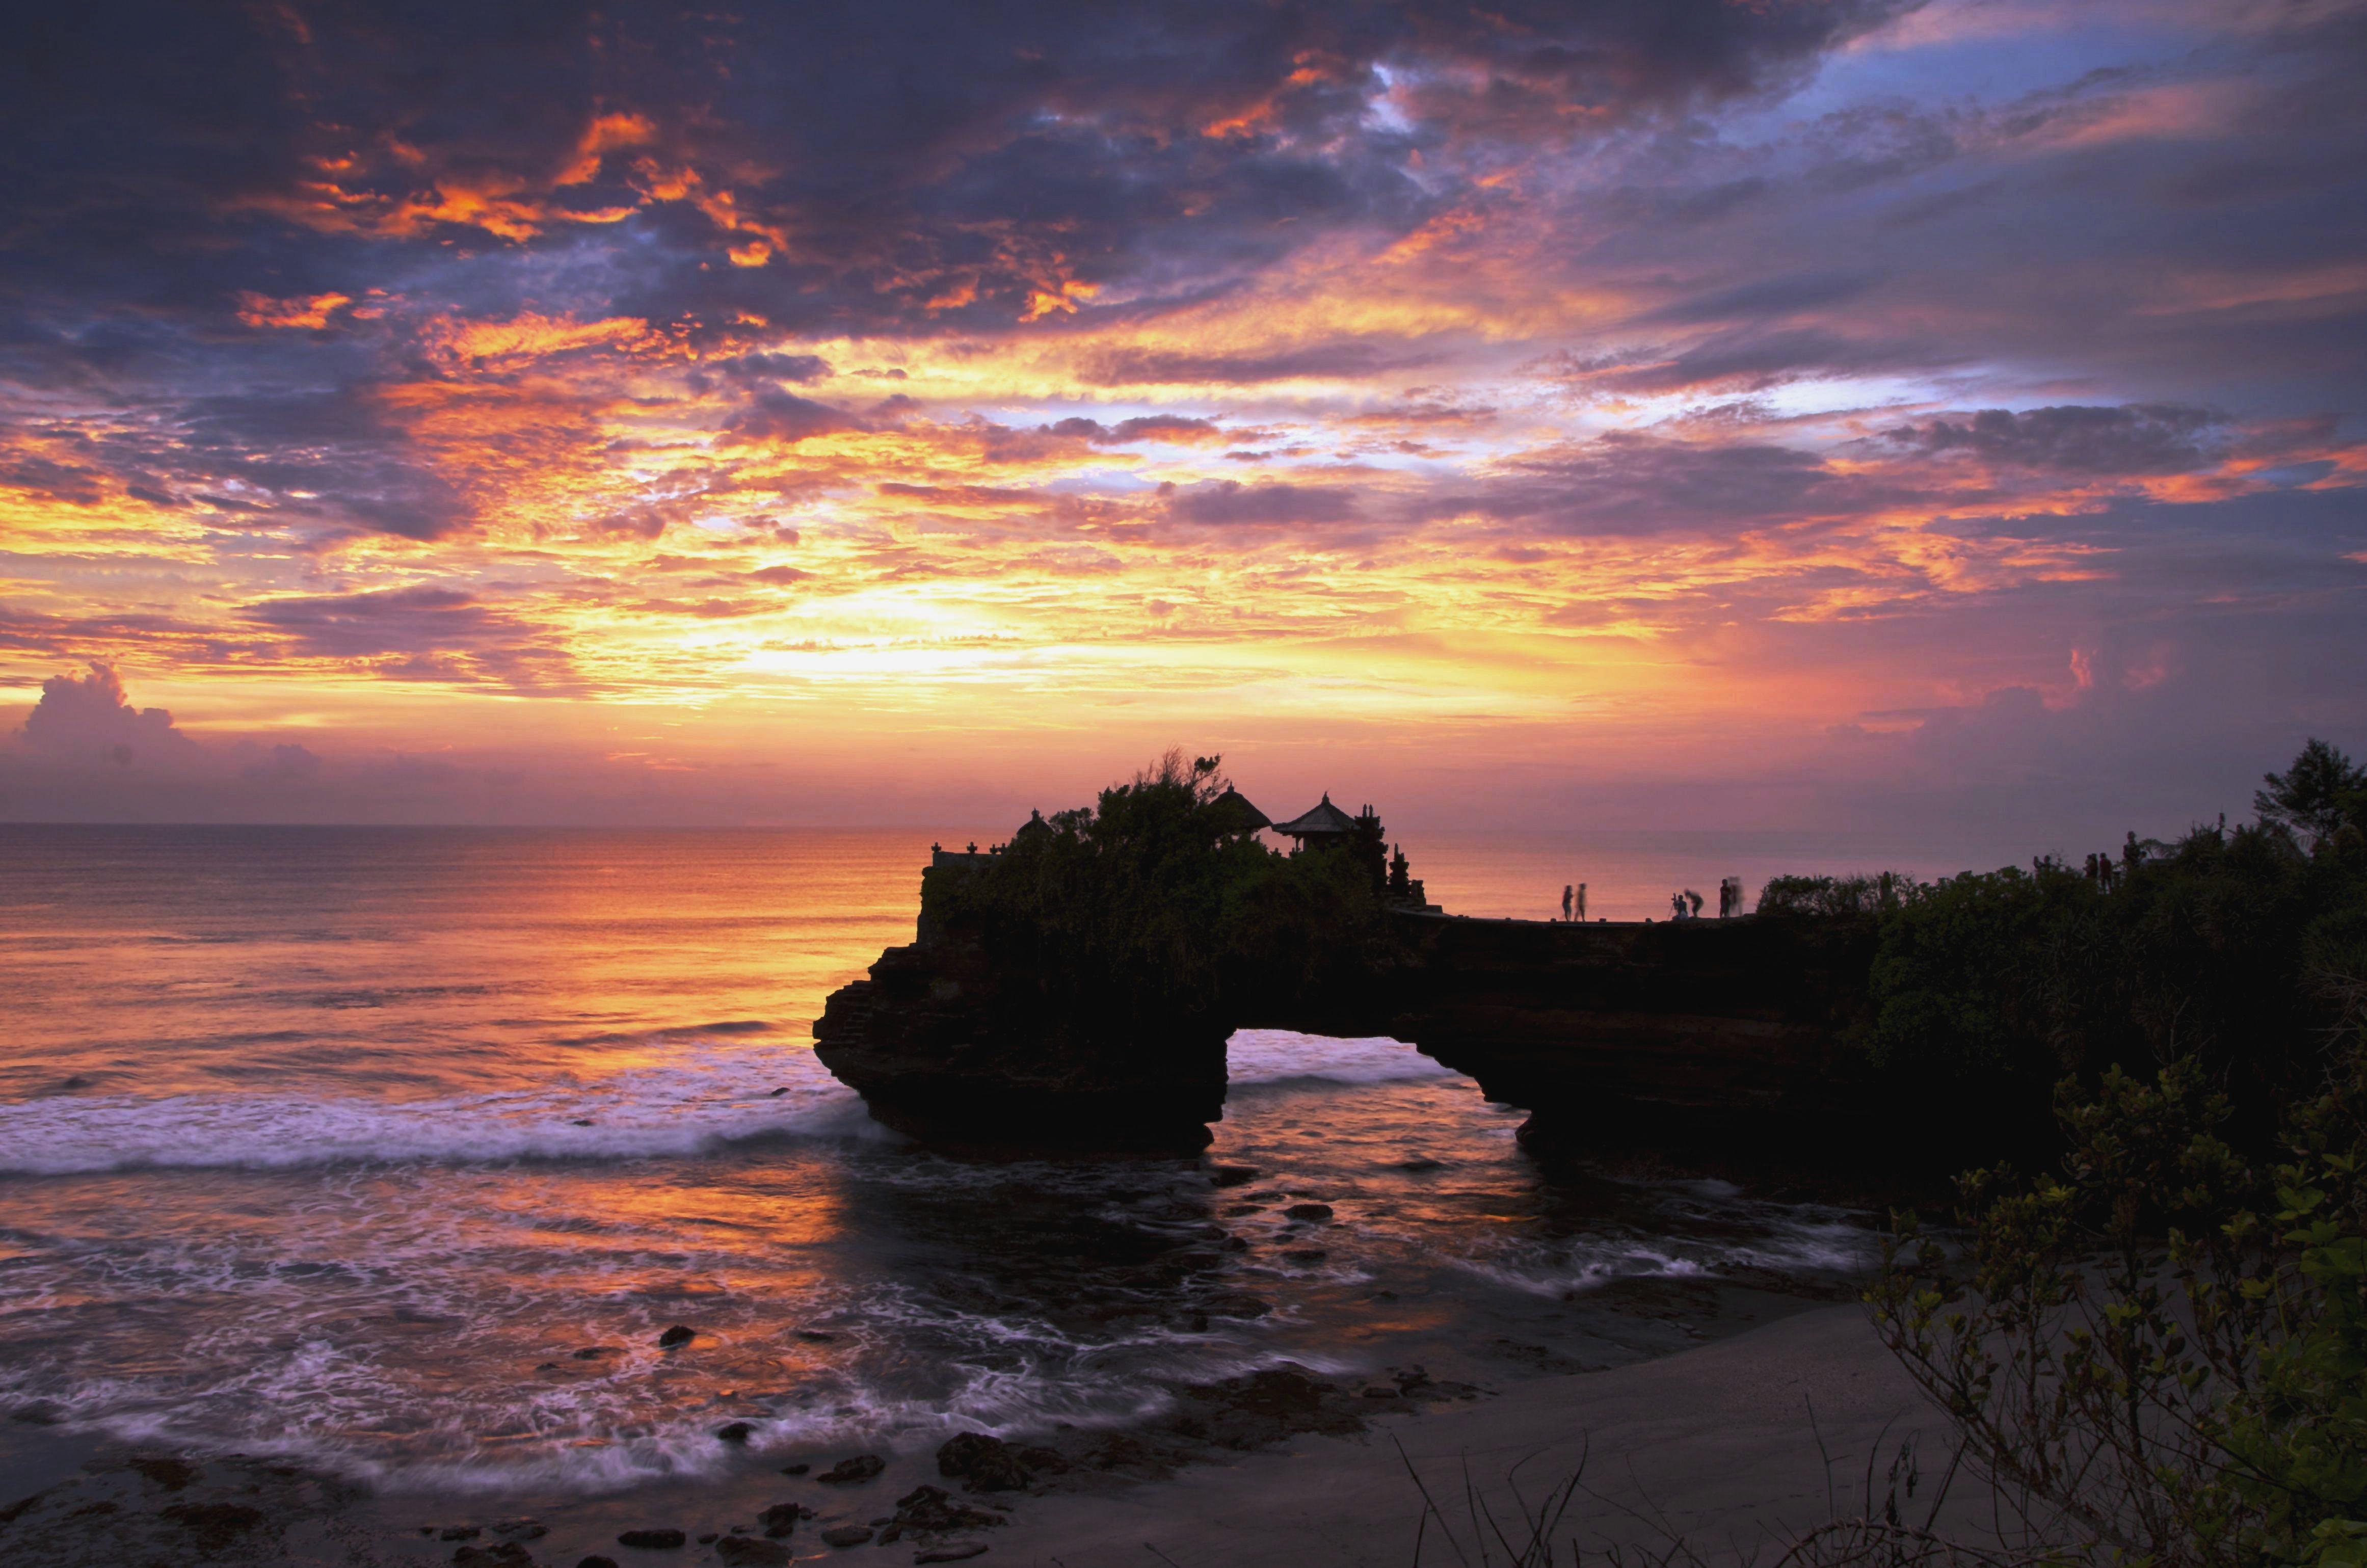 bali-tanah-lot-temple-sunset